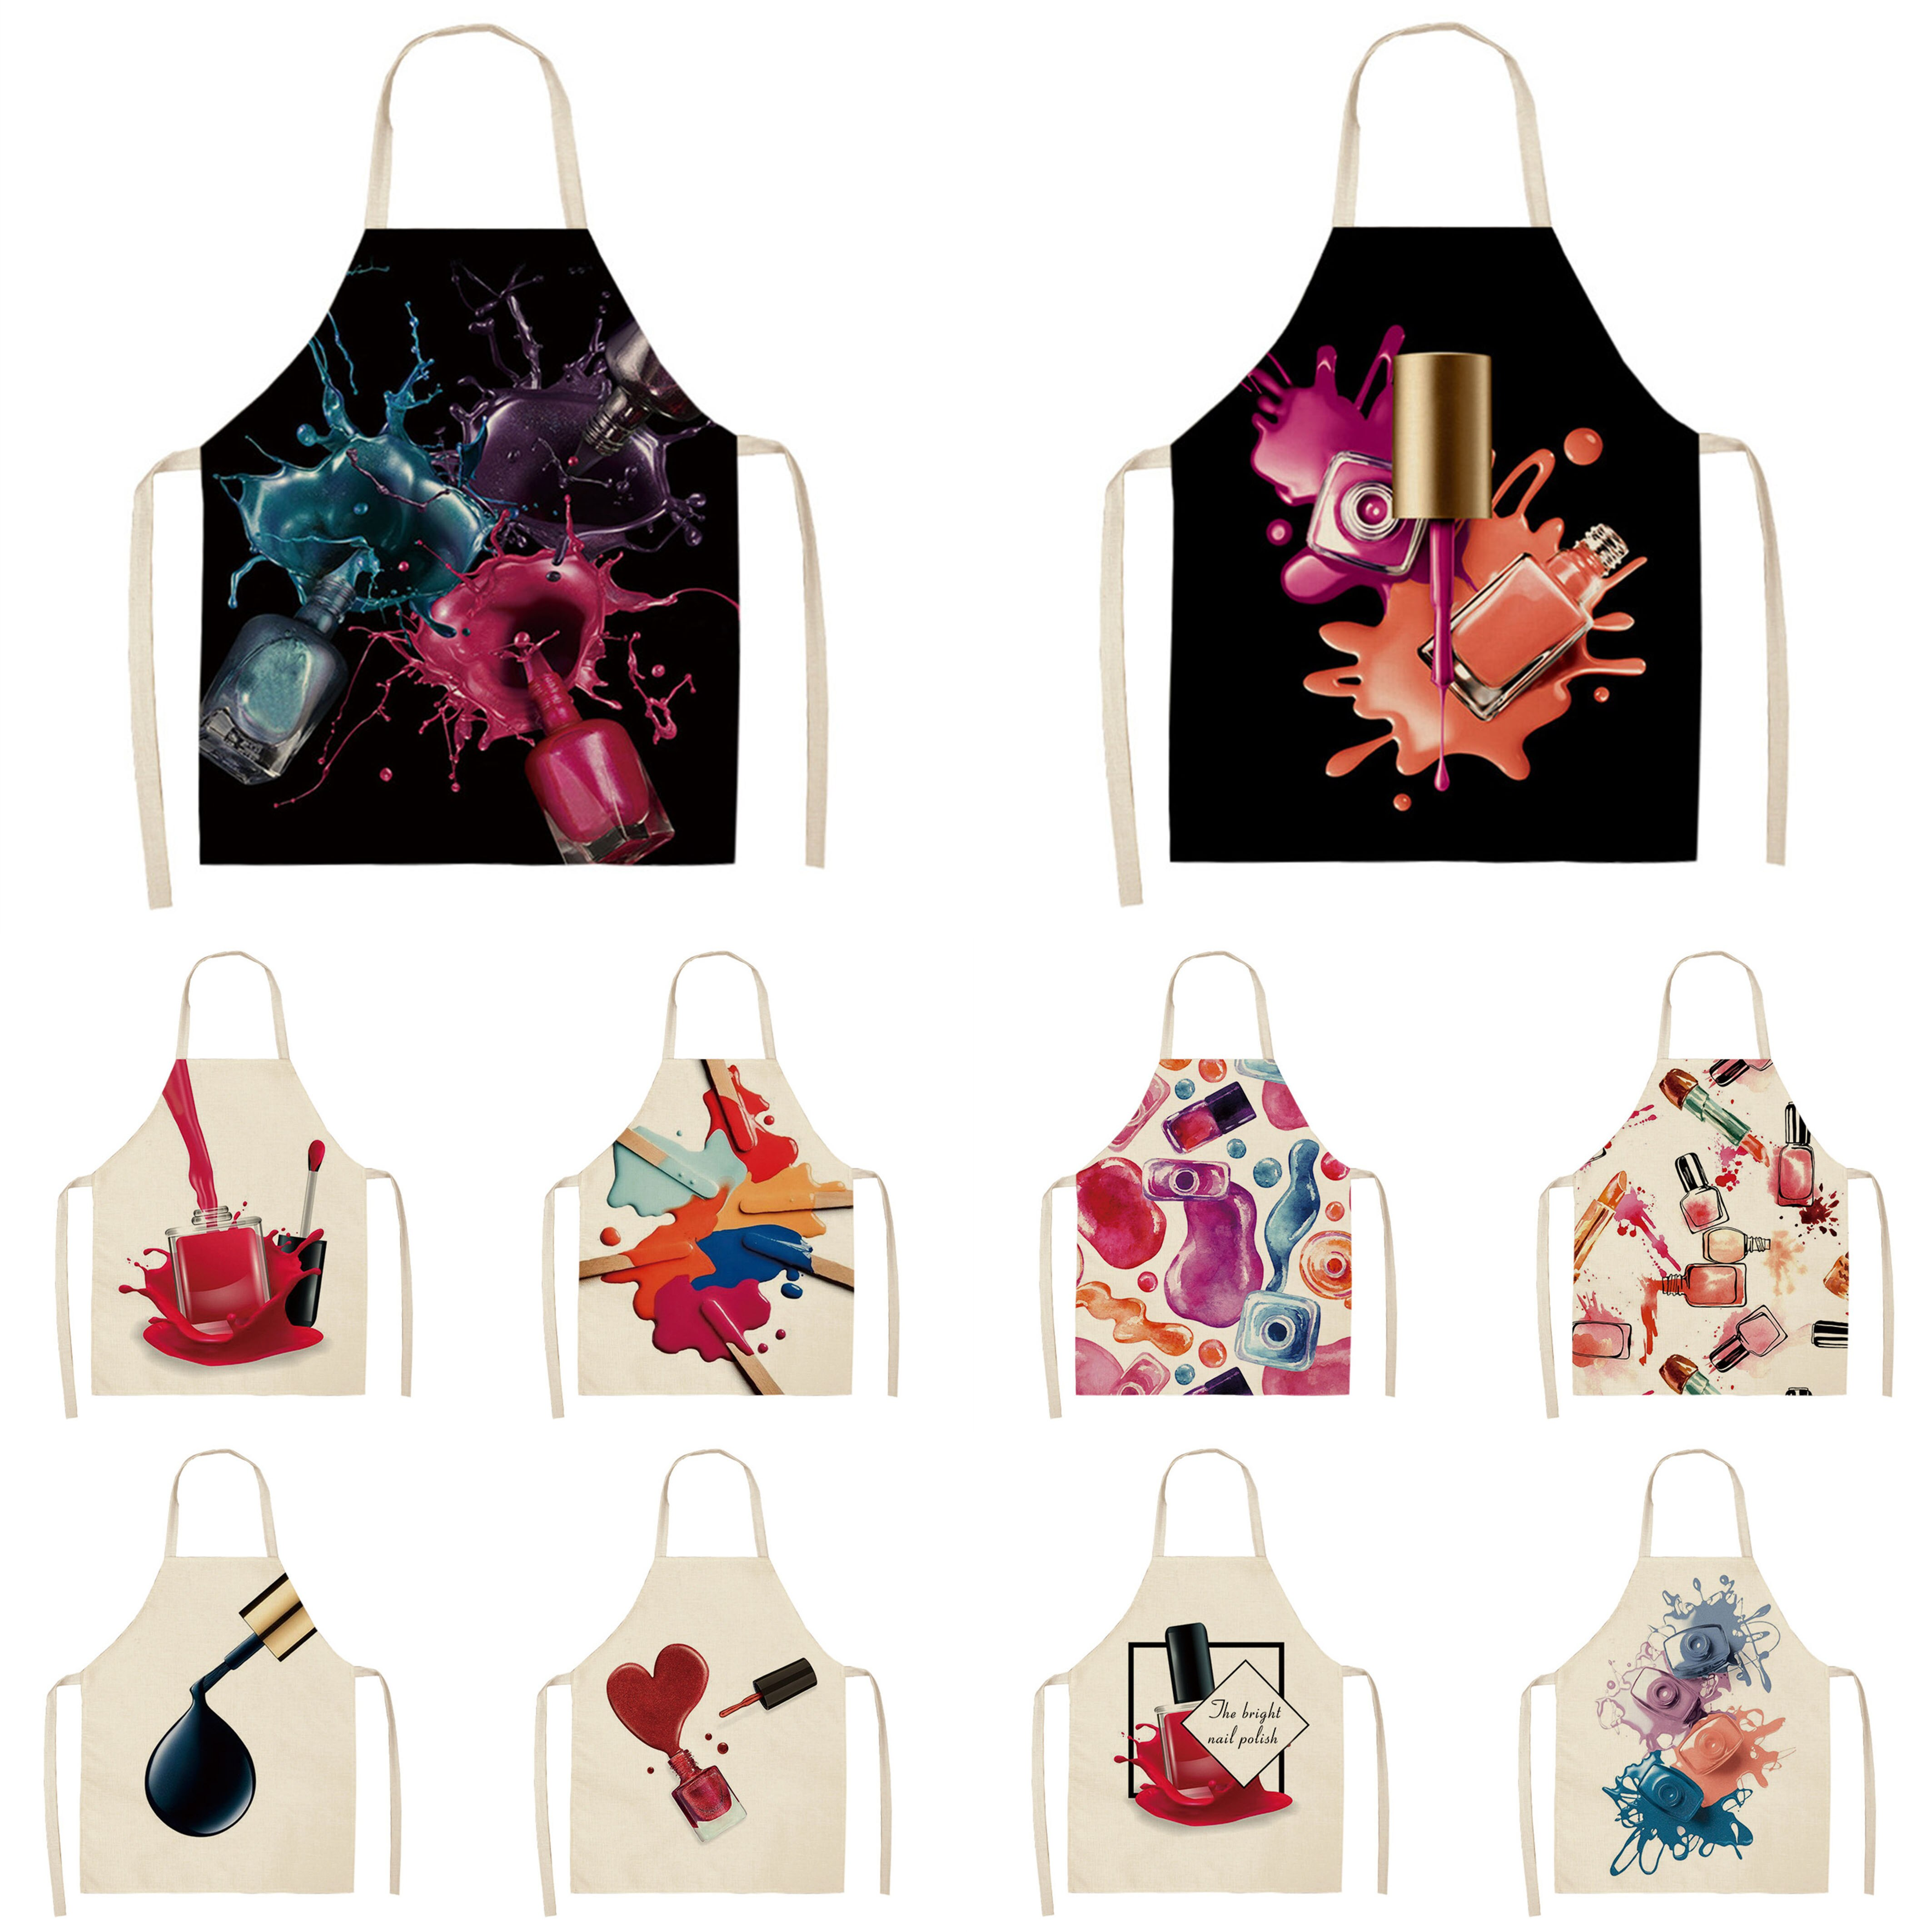 Kitchen Women Apron Color Nail polish bottle Printed Linen Adult Childs leeveless Aprons 53x65cm Wat